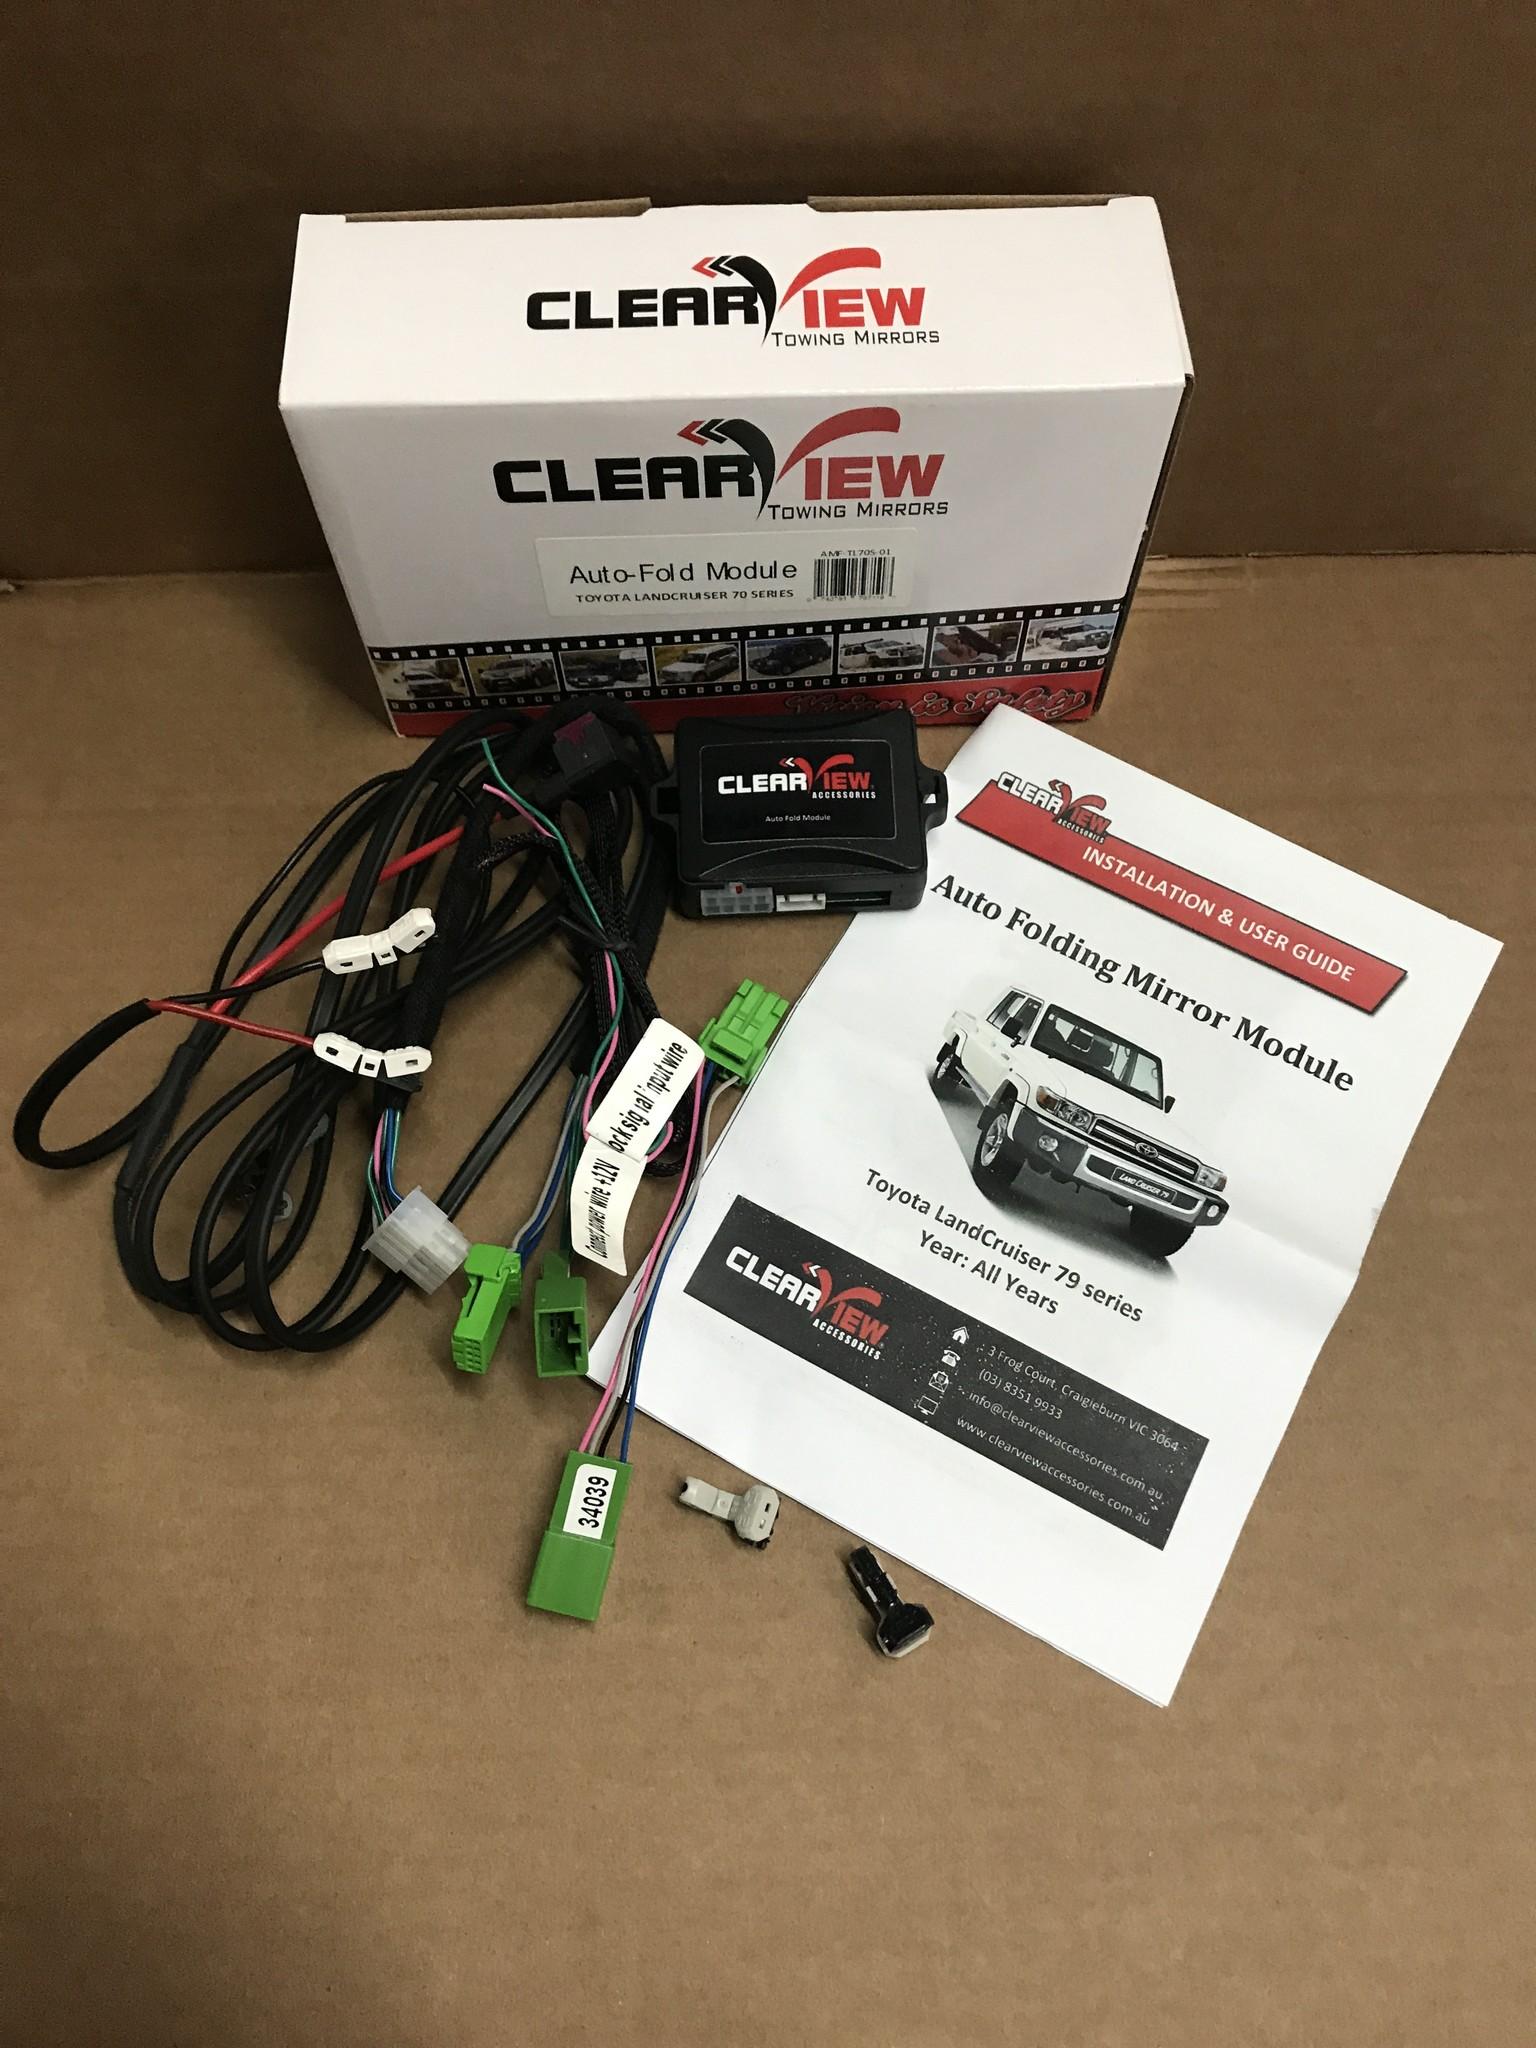 ClearView Auto-Fold Module voor inklapbare spiegels